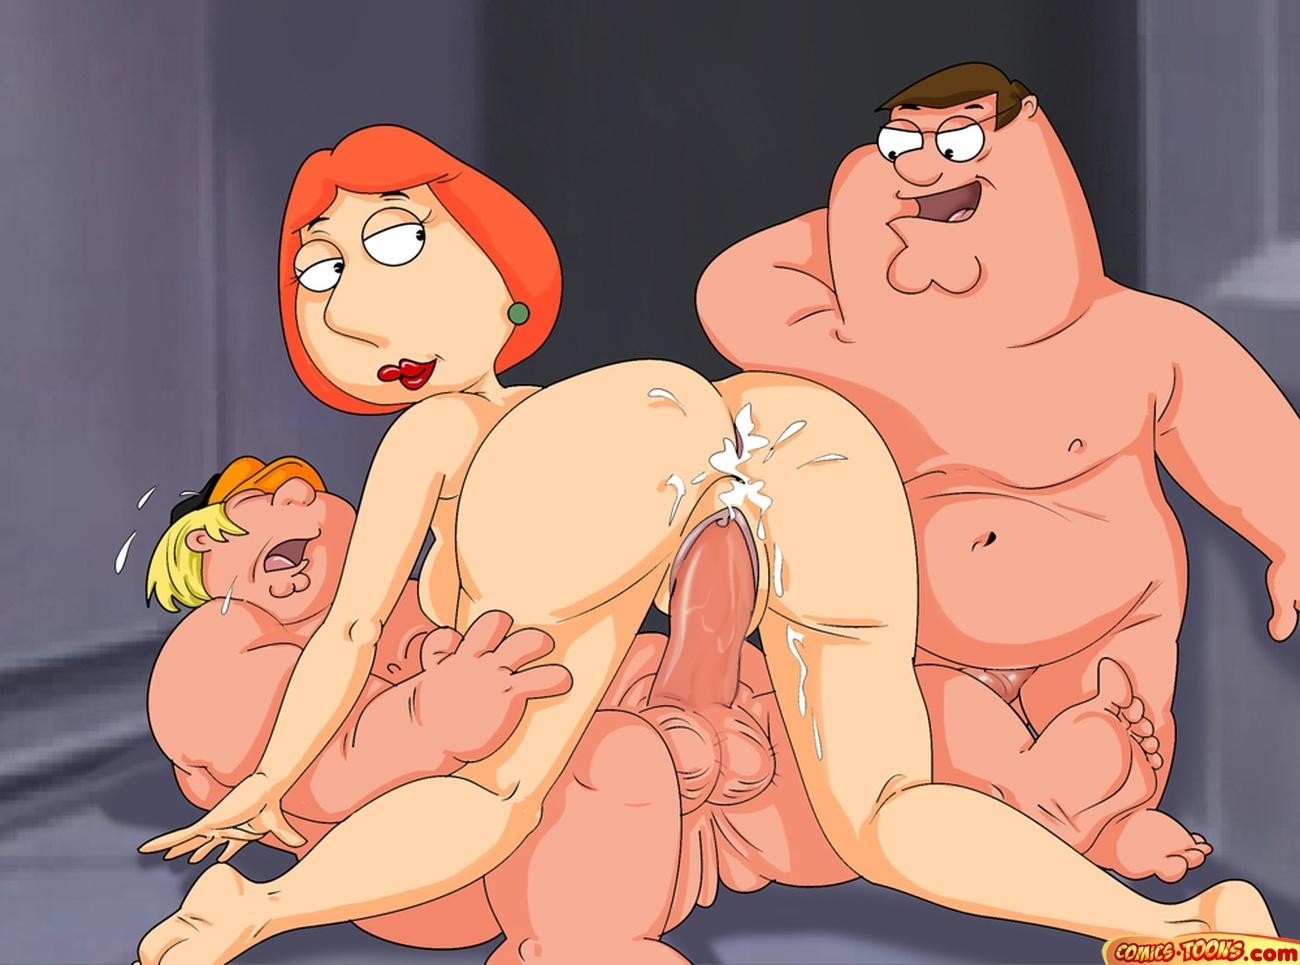 Potofani sex exploited scenes